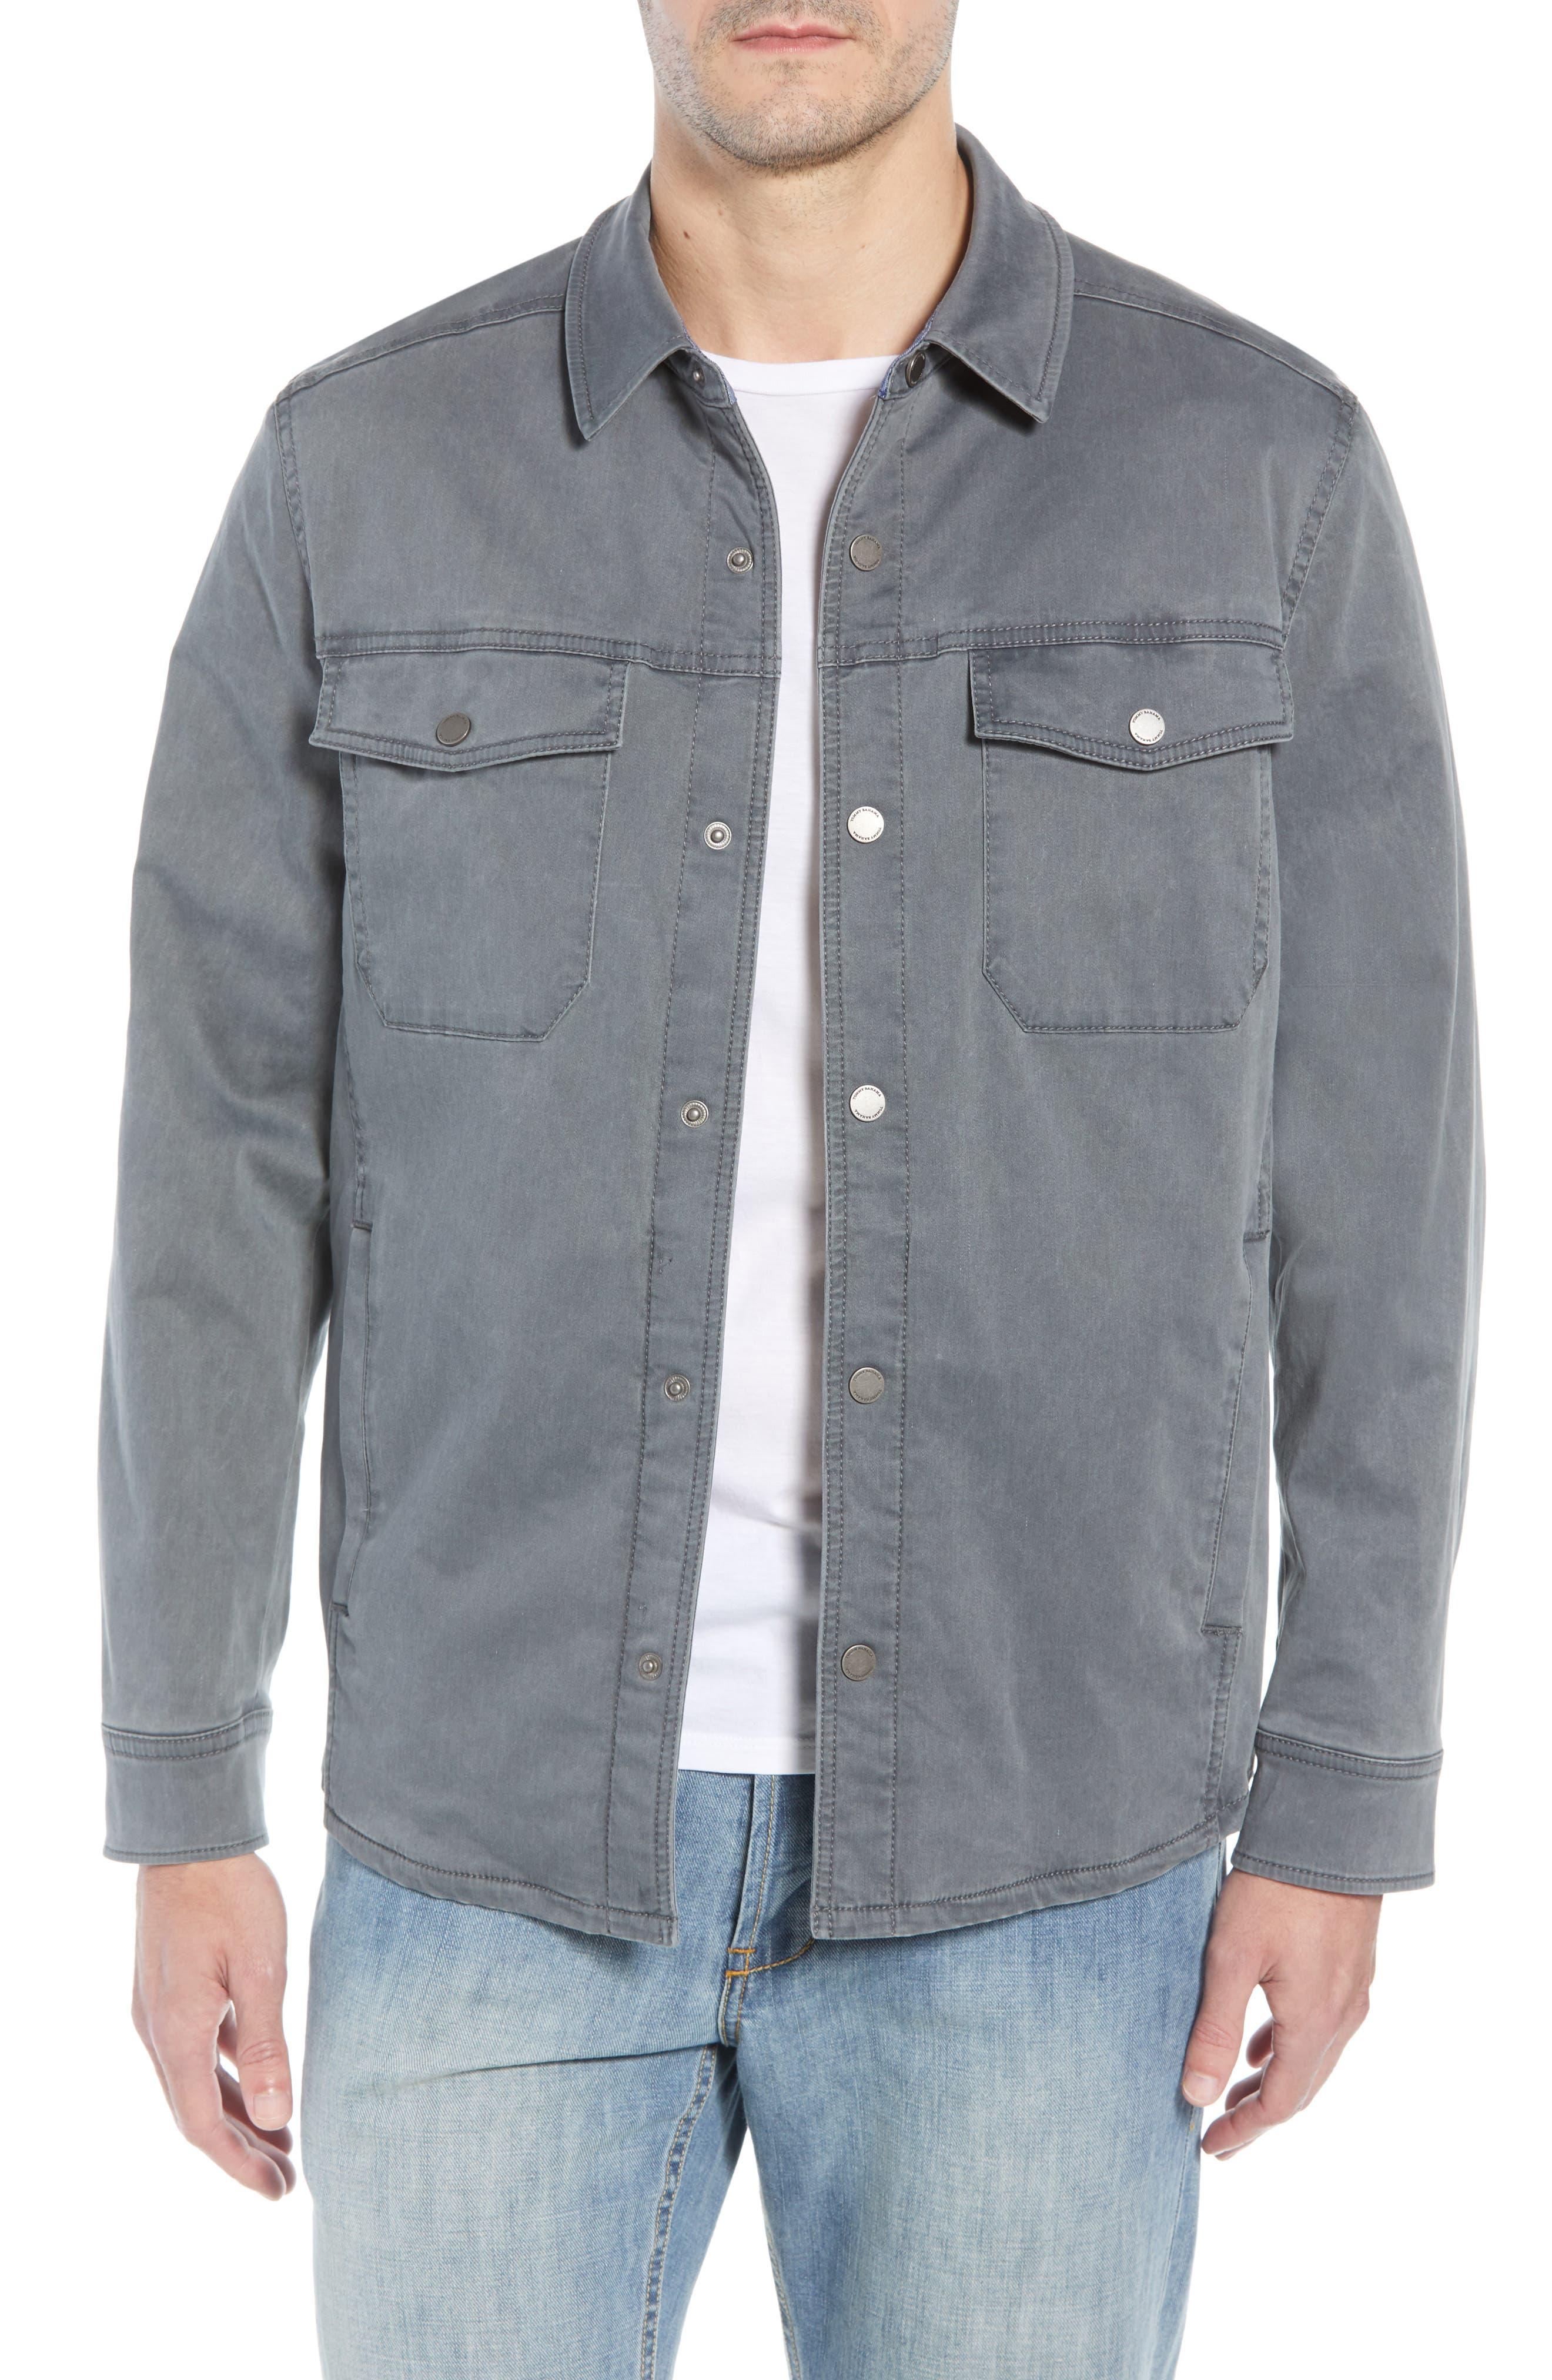 Boracay Regular Fit Shirt Jacket,                             Main thumbnail 1, color,                             FOG GREY